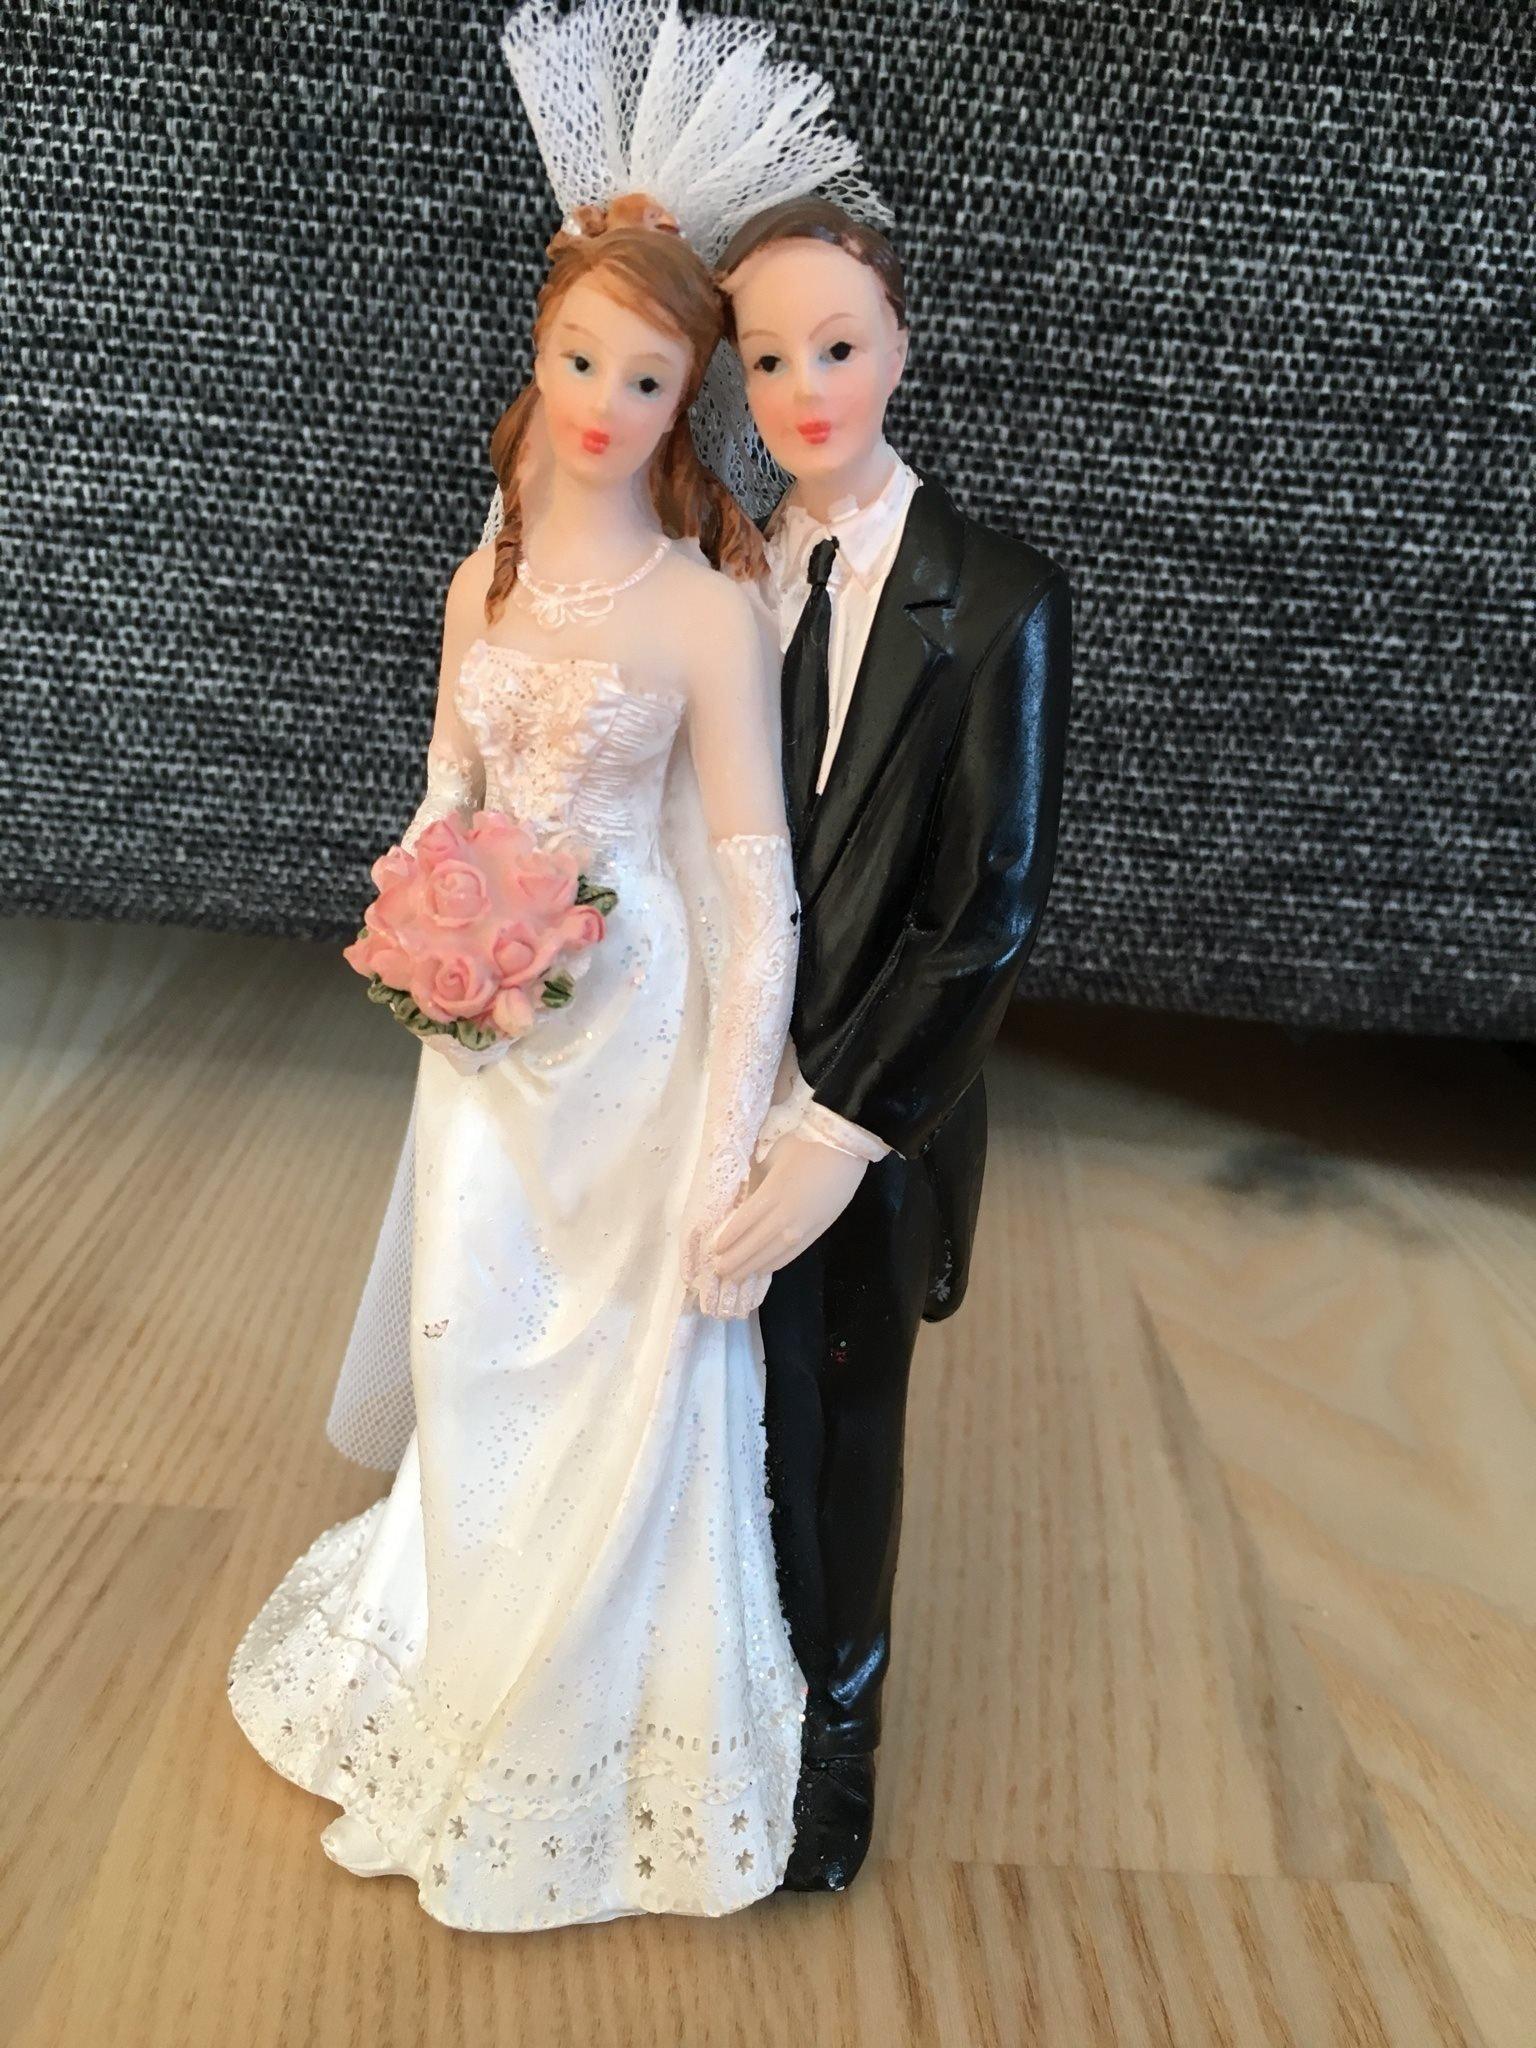 f8fbe17a5111 Ny tårtdekoration bröllop cake topper brudpar (352604152) ᐈ Köp på ...